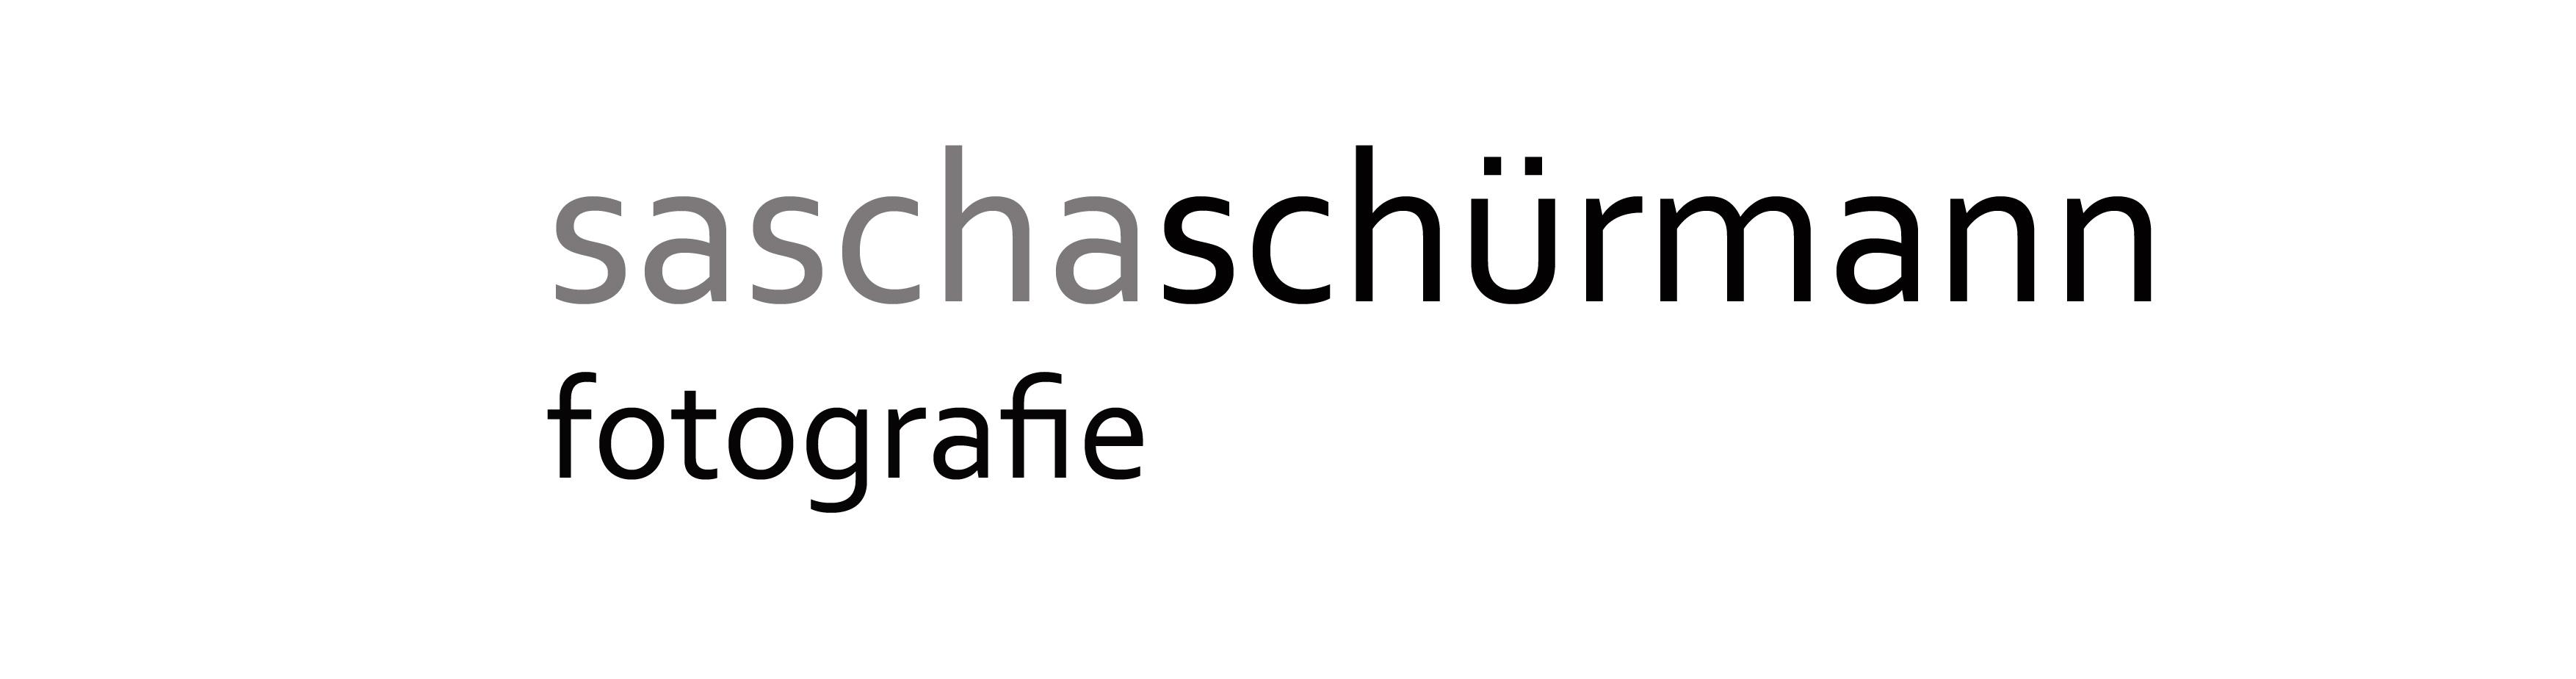 Sascha Schürmann - fotografie